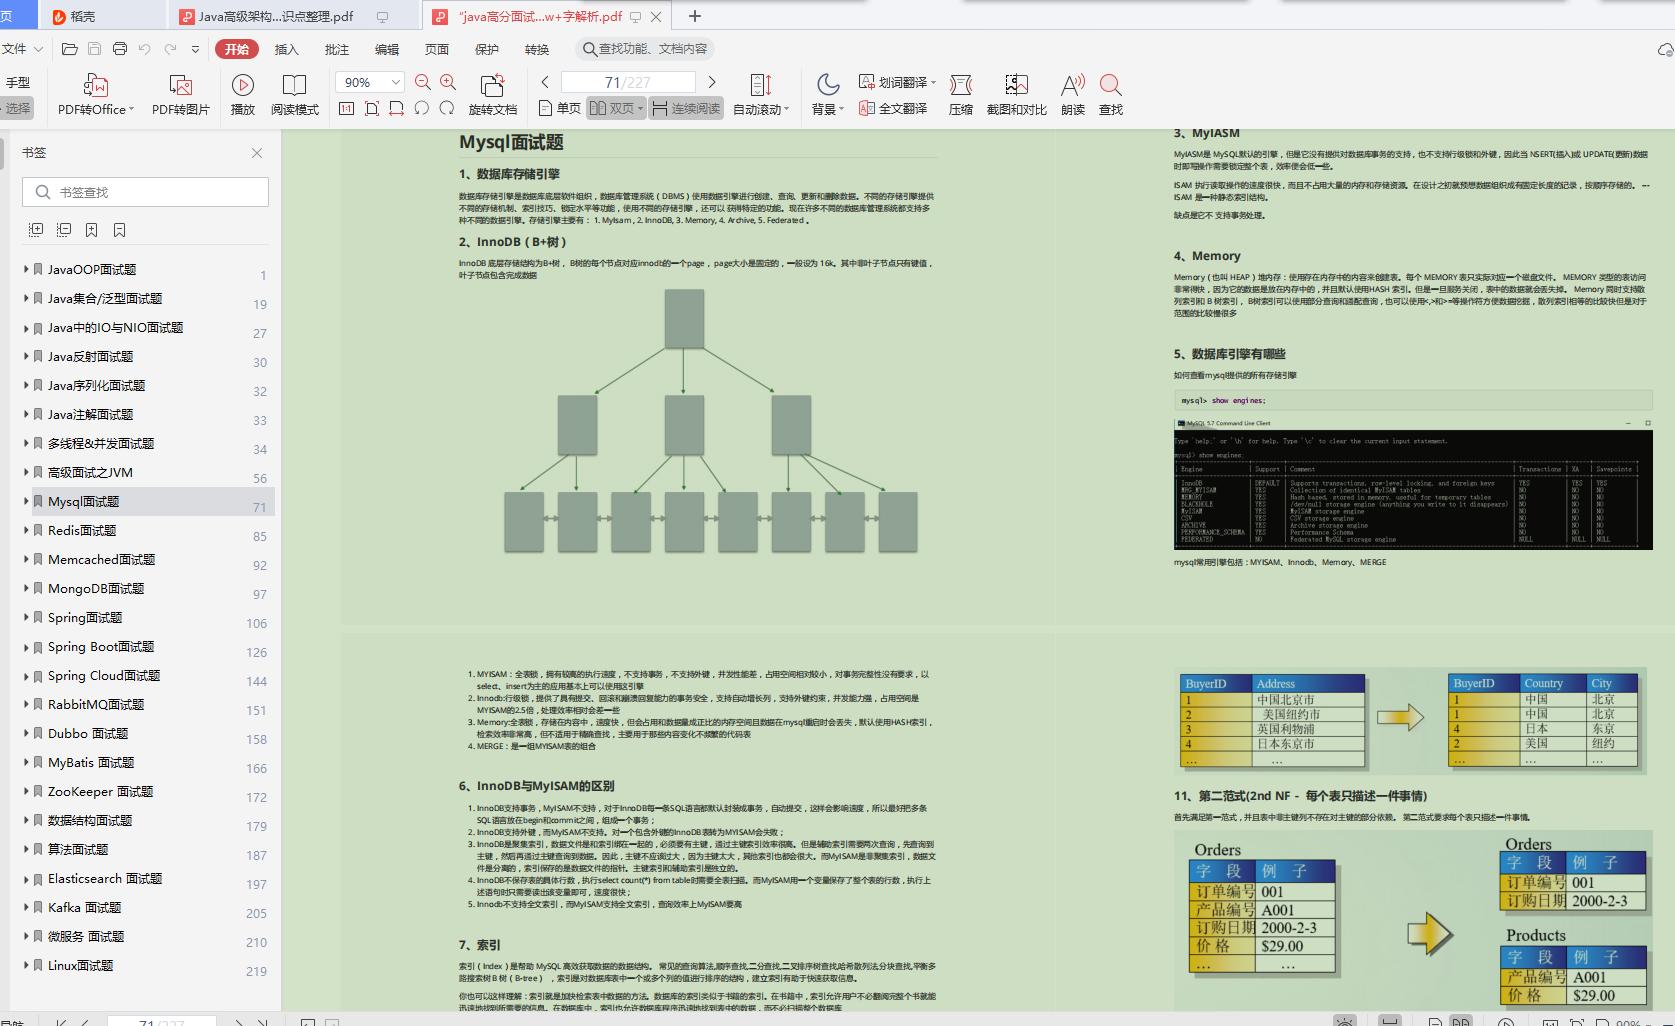 Java高分面试指南-25分类227页1000+题50w+字解析